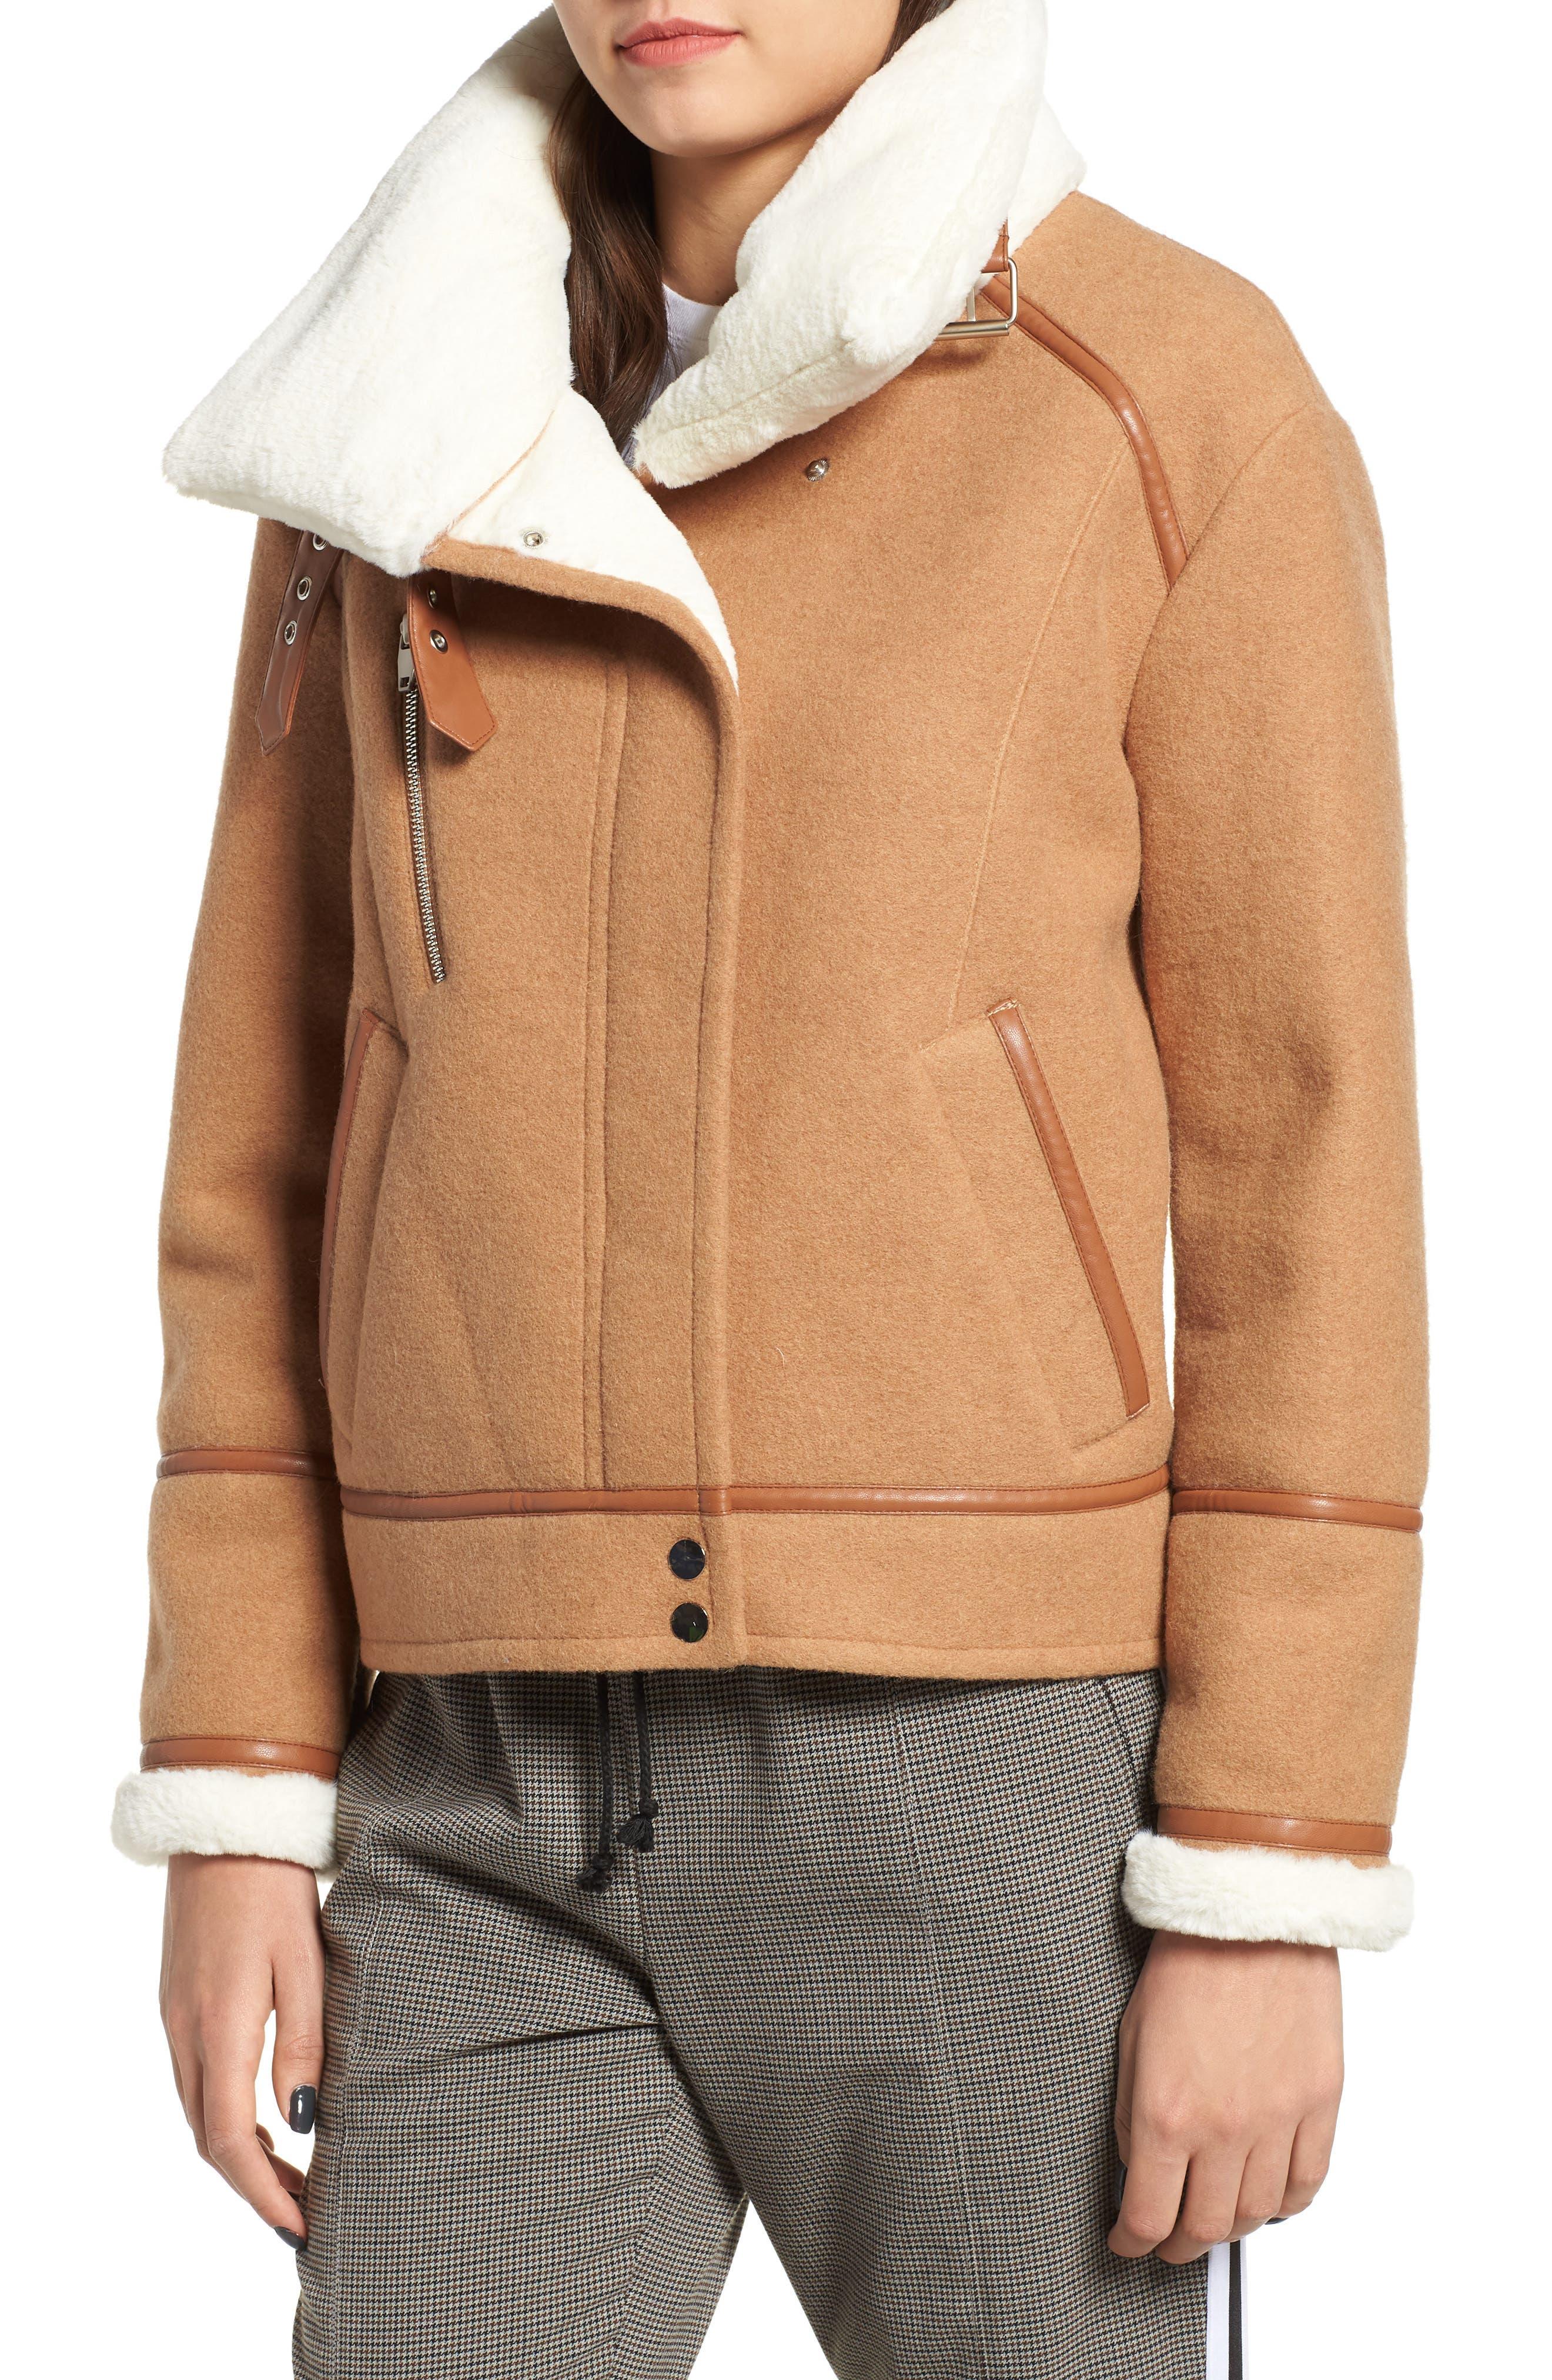 NVLT, Brushed Melton Wool Blend Jacket, Alternate thumbnail 5, color, CAMEL/ CREAM